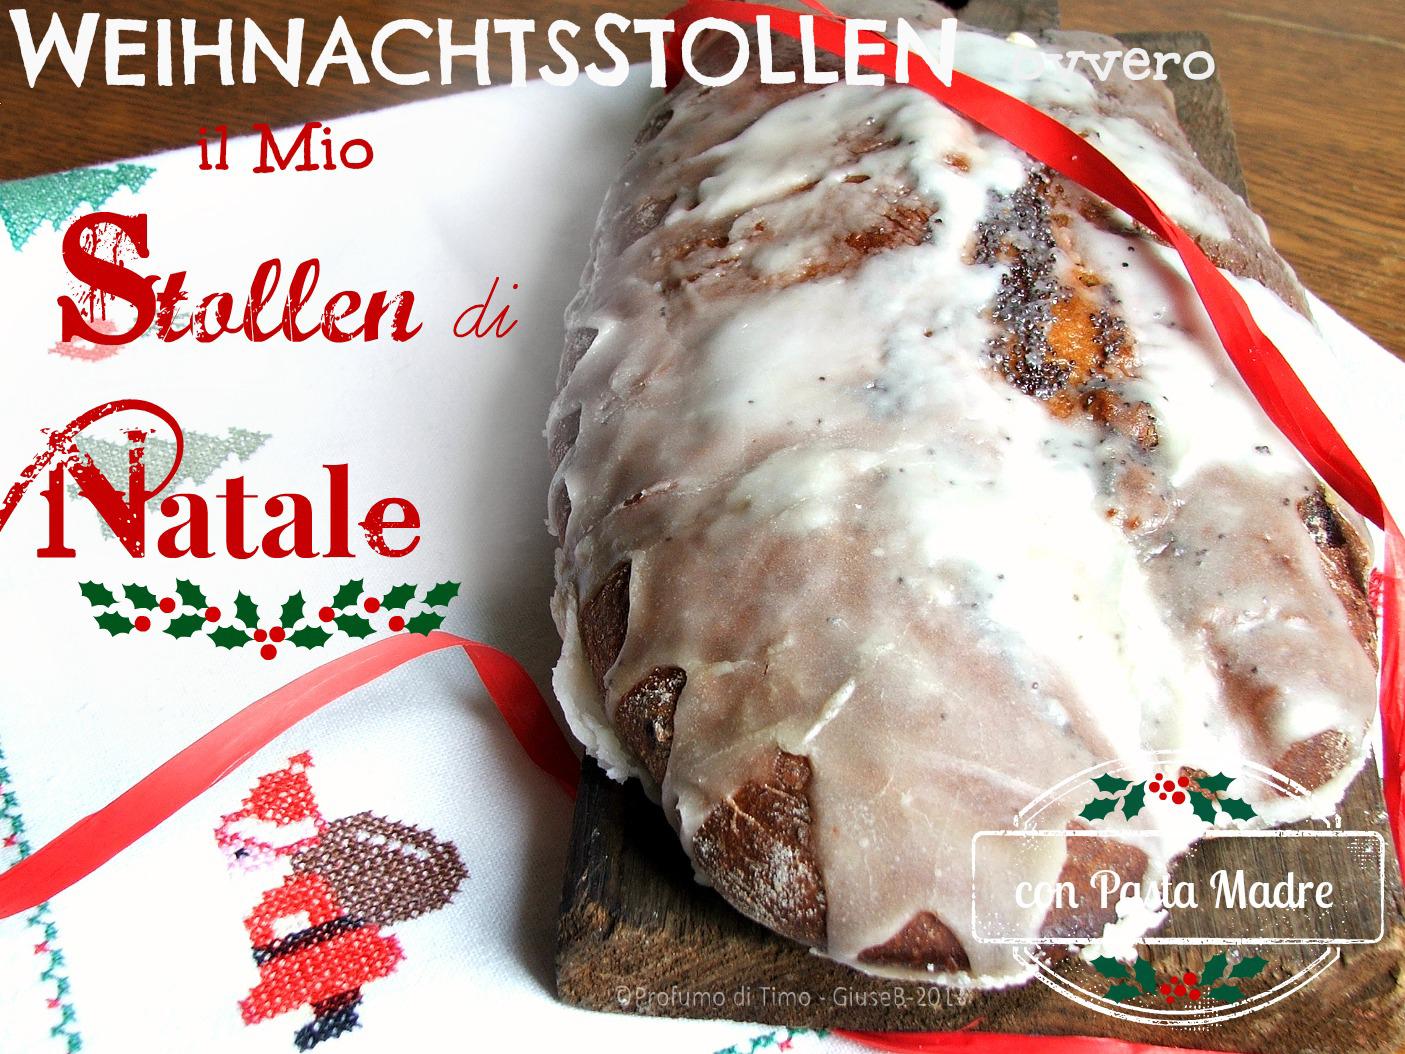 WeihnachtsStollen con Pasta Madre ovvero il mio STOLLEN di NATALE